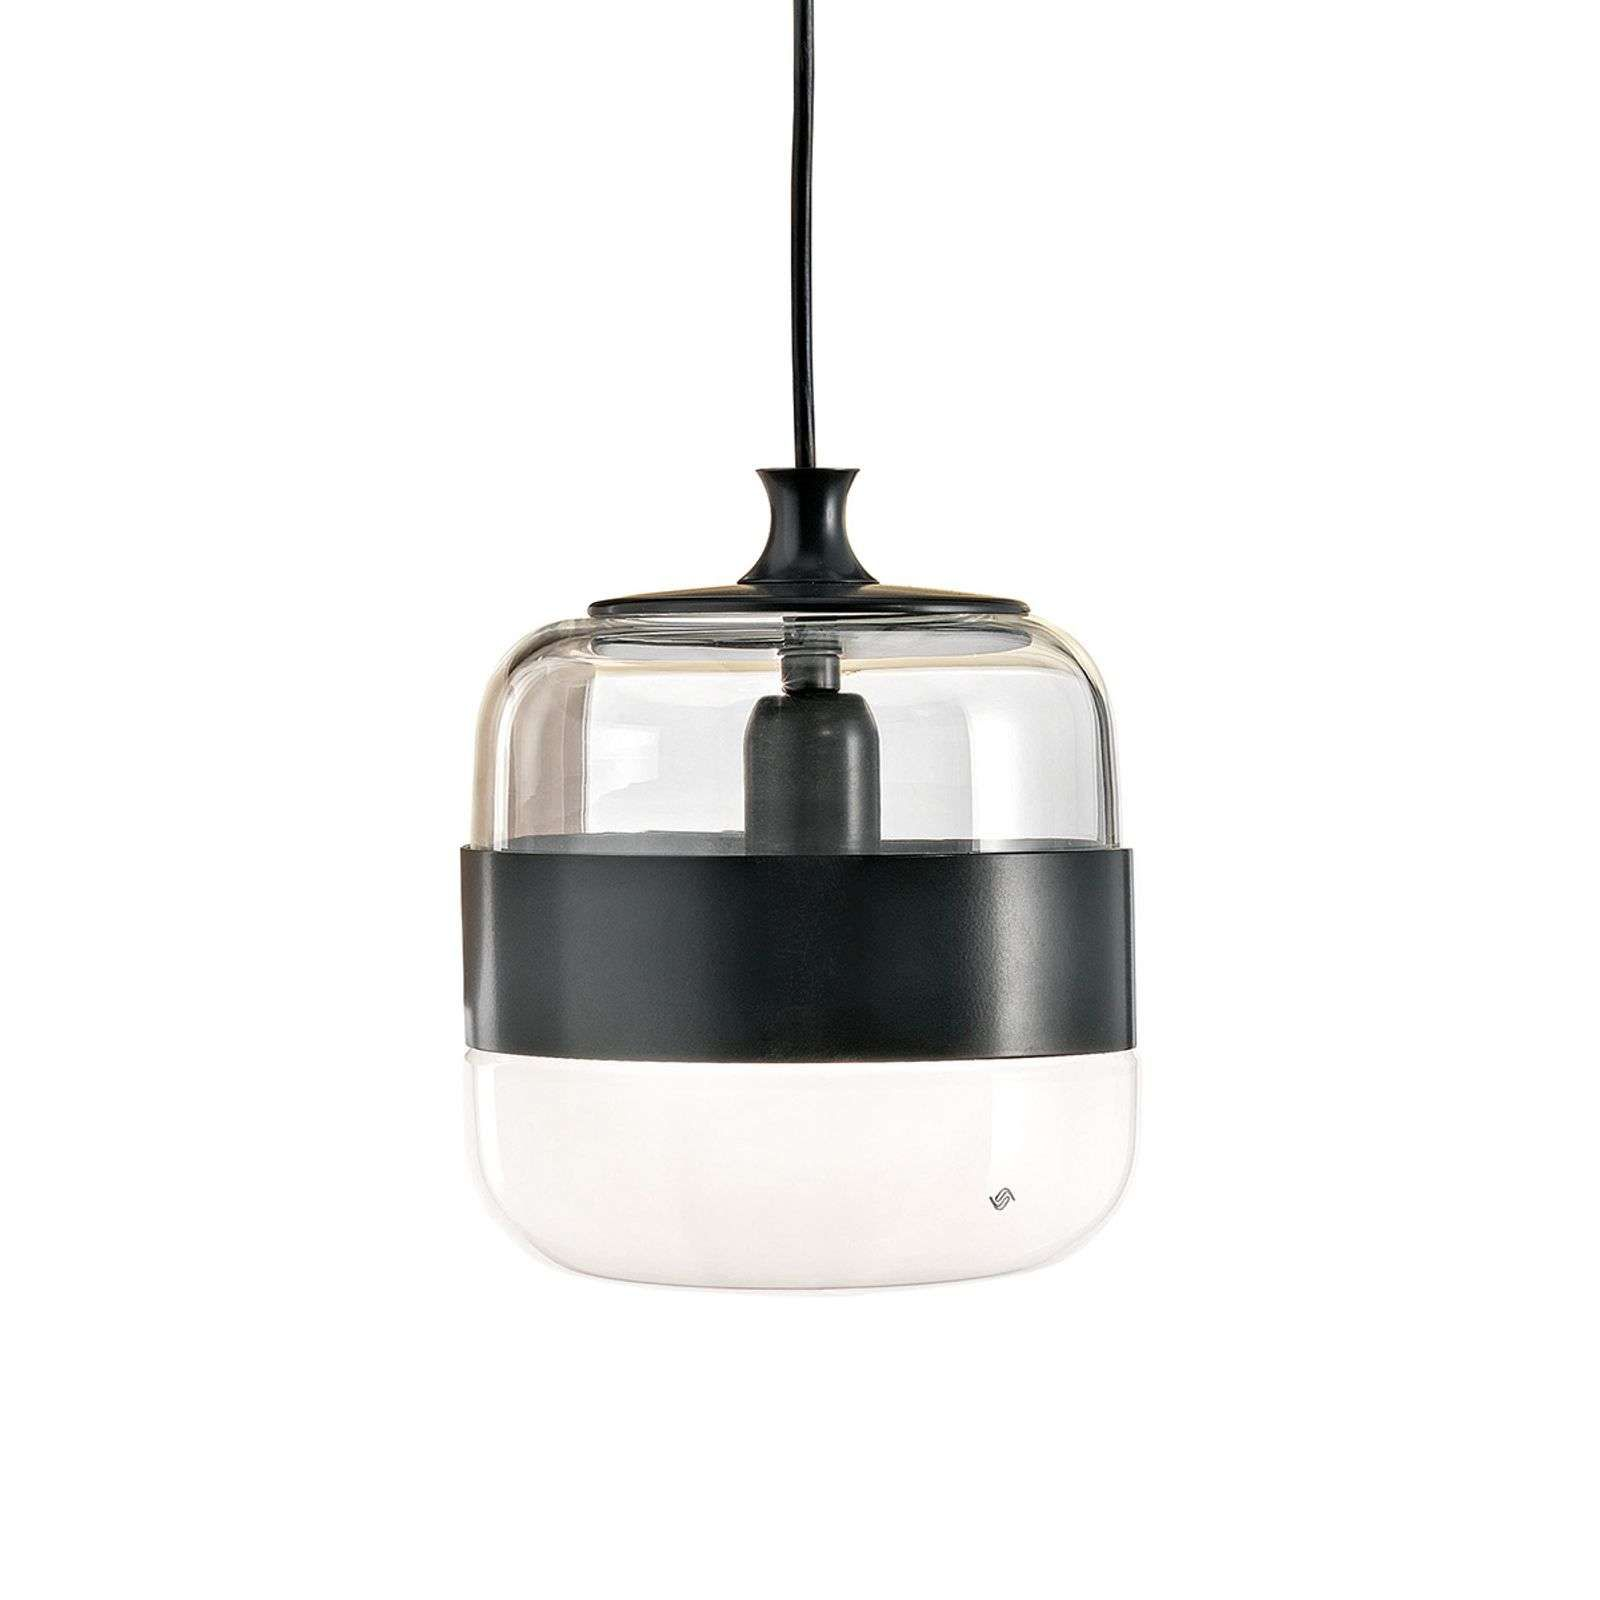 Suspension designer Futura verre de Murano, 20cm